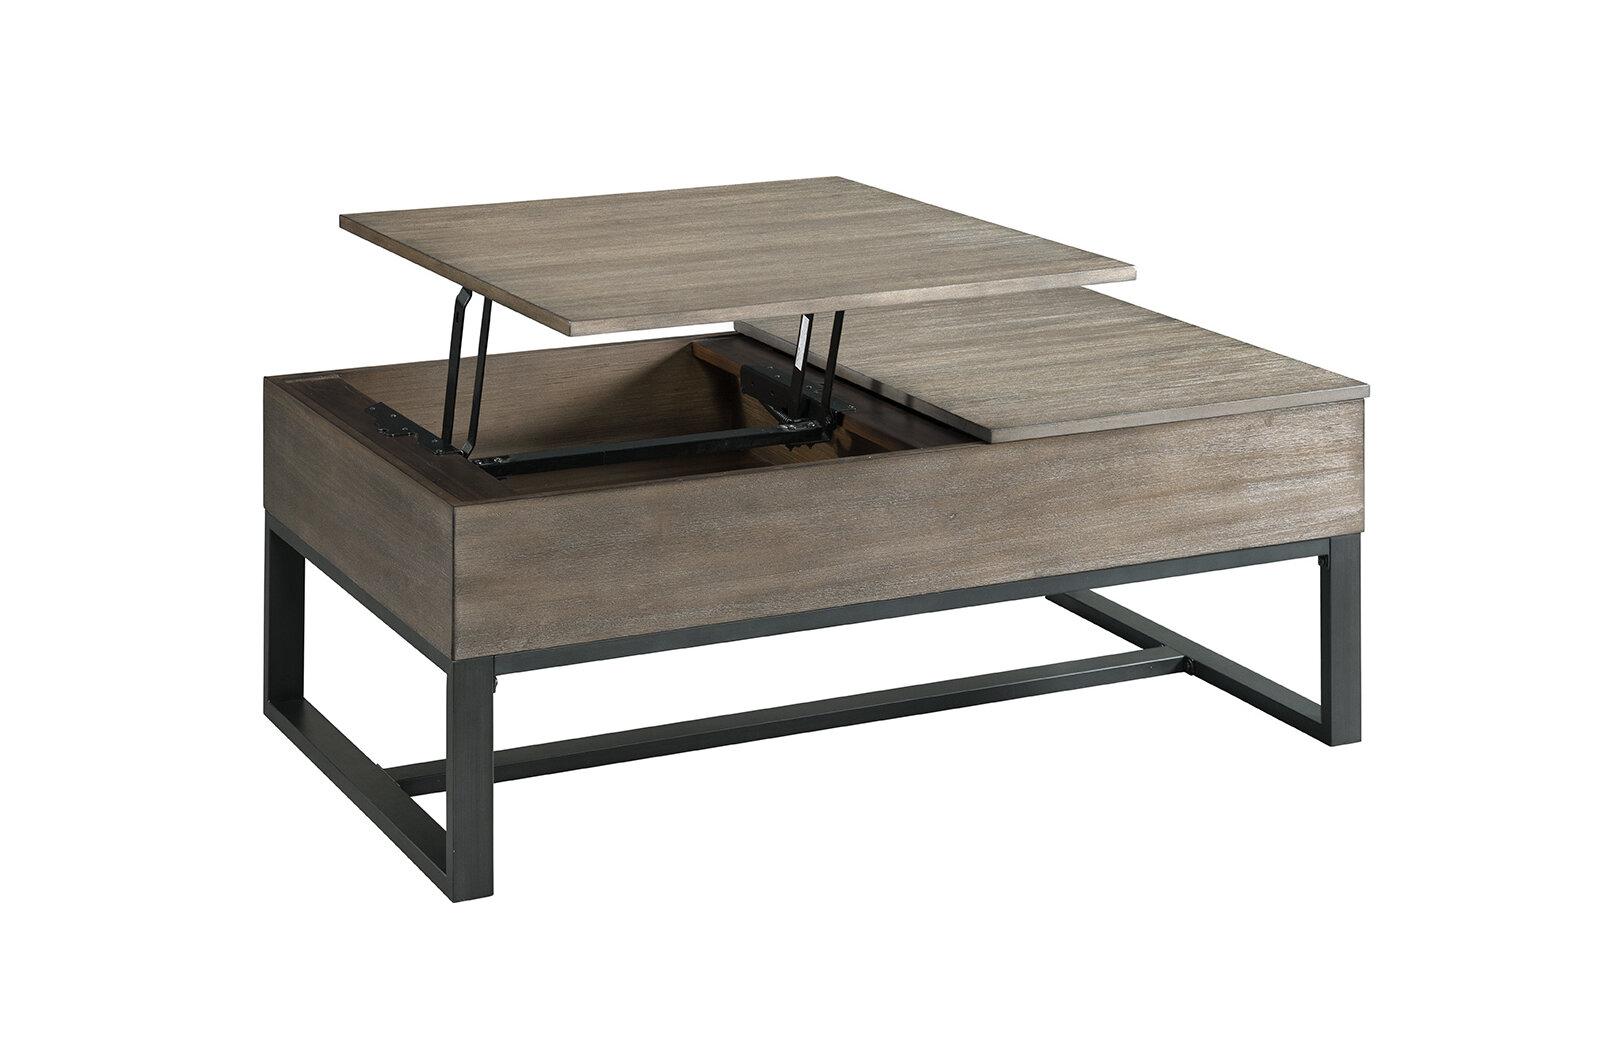 Williston Forge Houser Lift Top Coffee Table Reviews Wayfair [ 1043 x 1604 Pixel ]